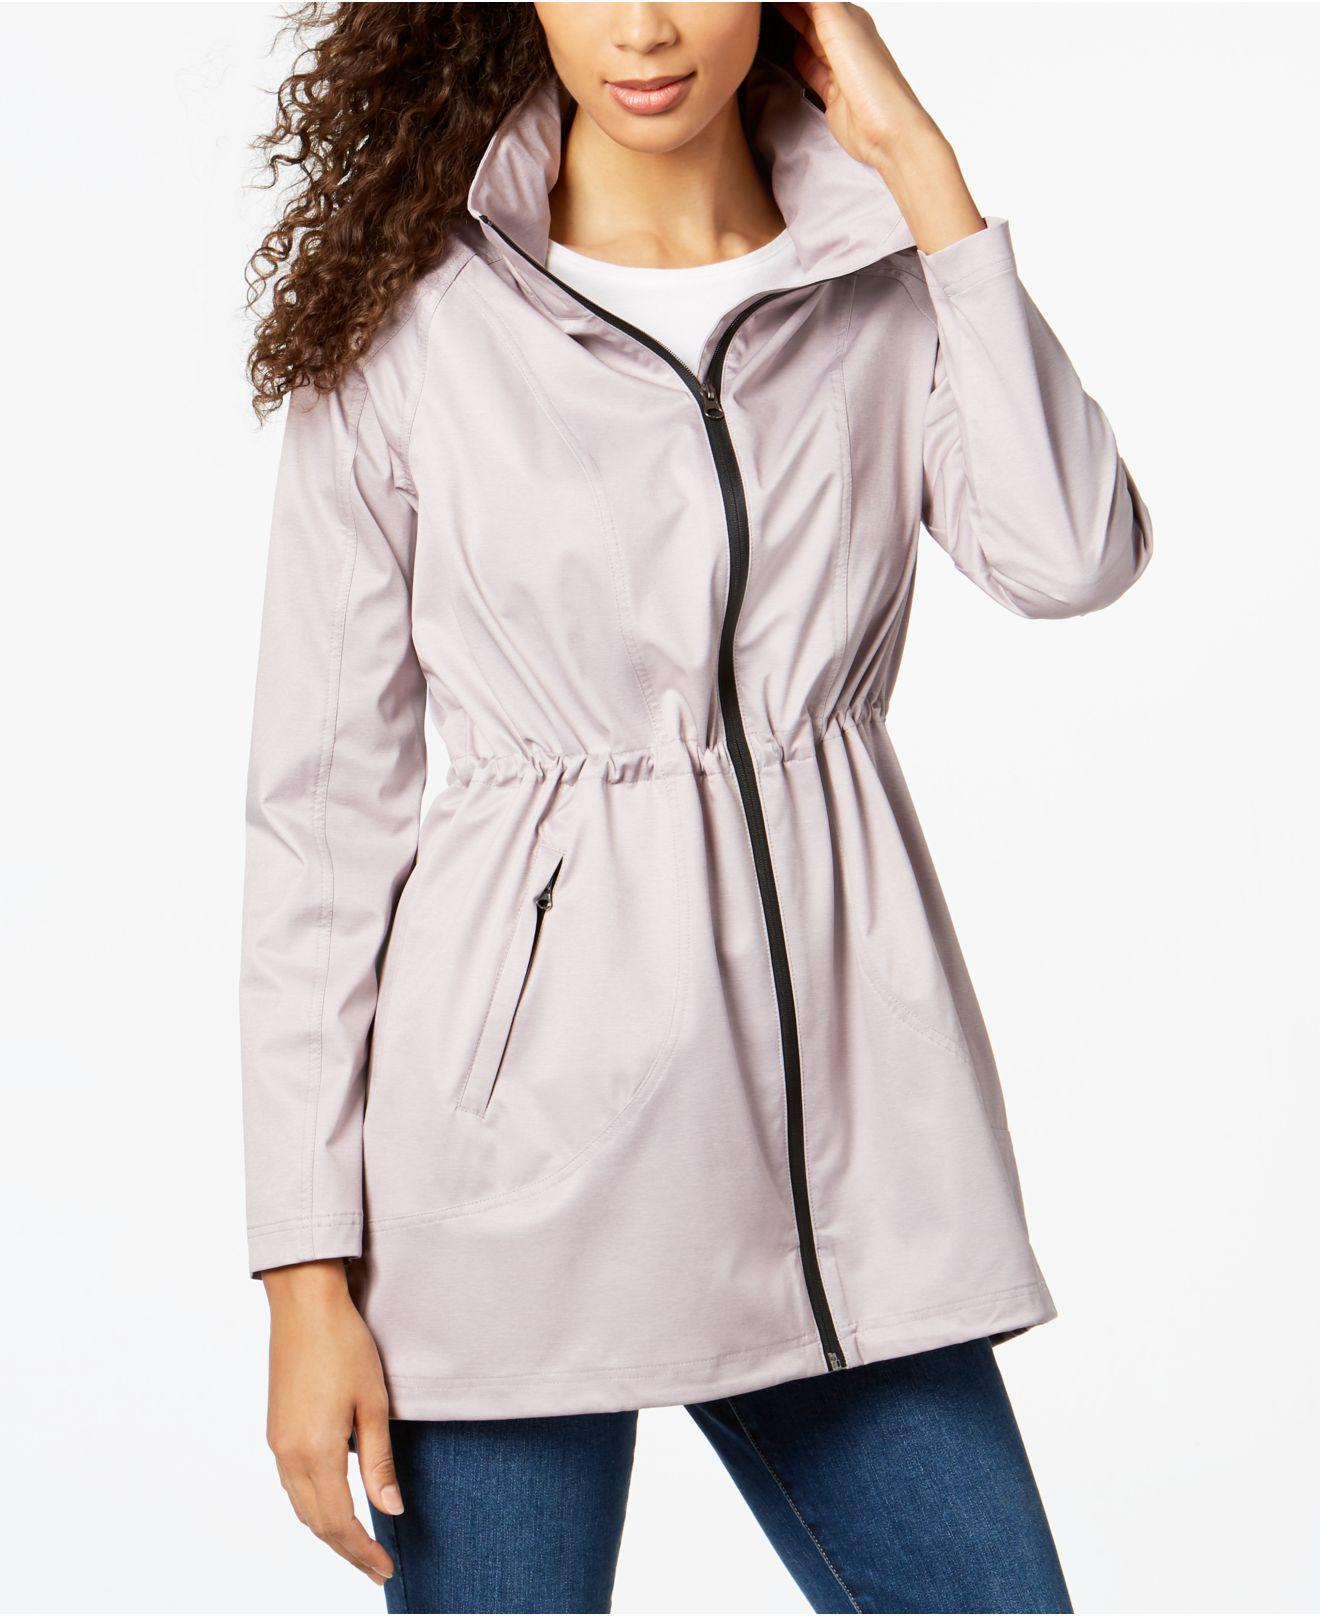 35f5af231ad65 Lyst - 32 Degrees Hooded Waterproof Anorak Raincoat